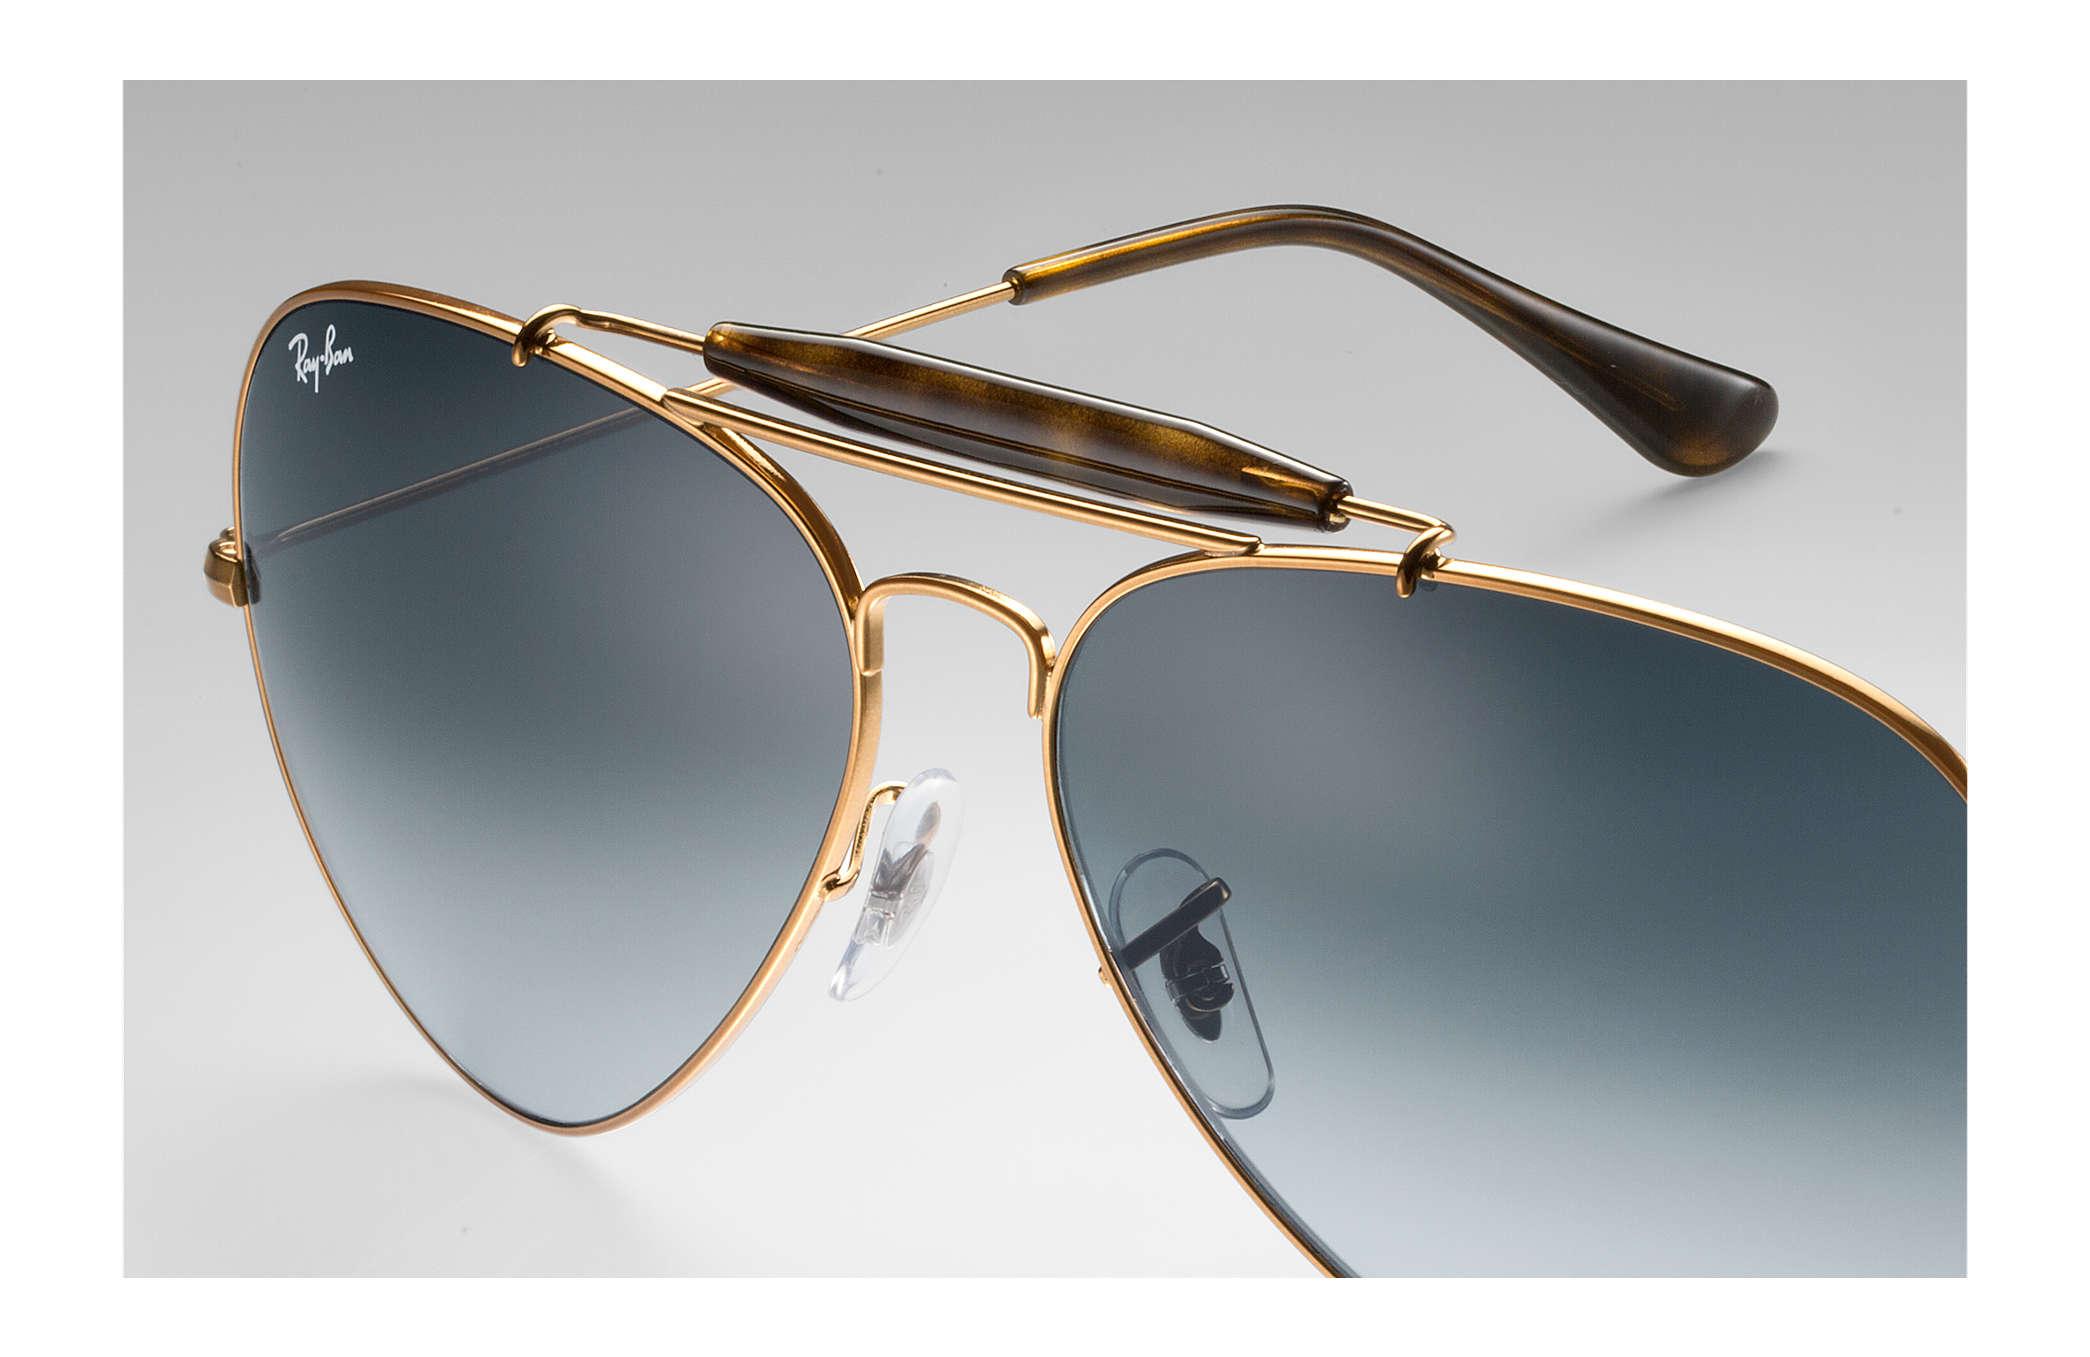 5baa95bfed6 Ray-Ban Outdoorsman Ii RB3029 Bronze-Copper - Metal - Grey Lenses ...